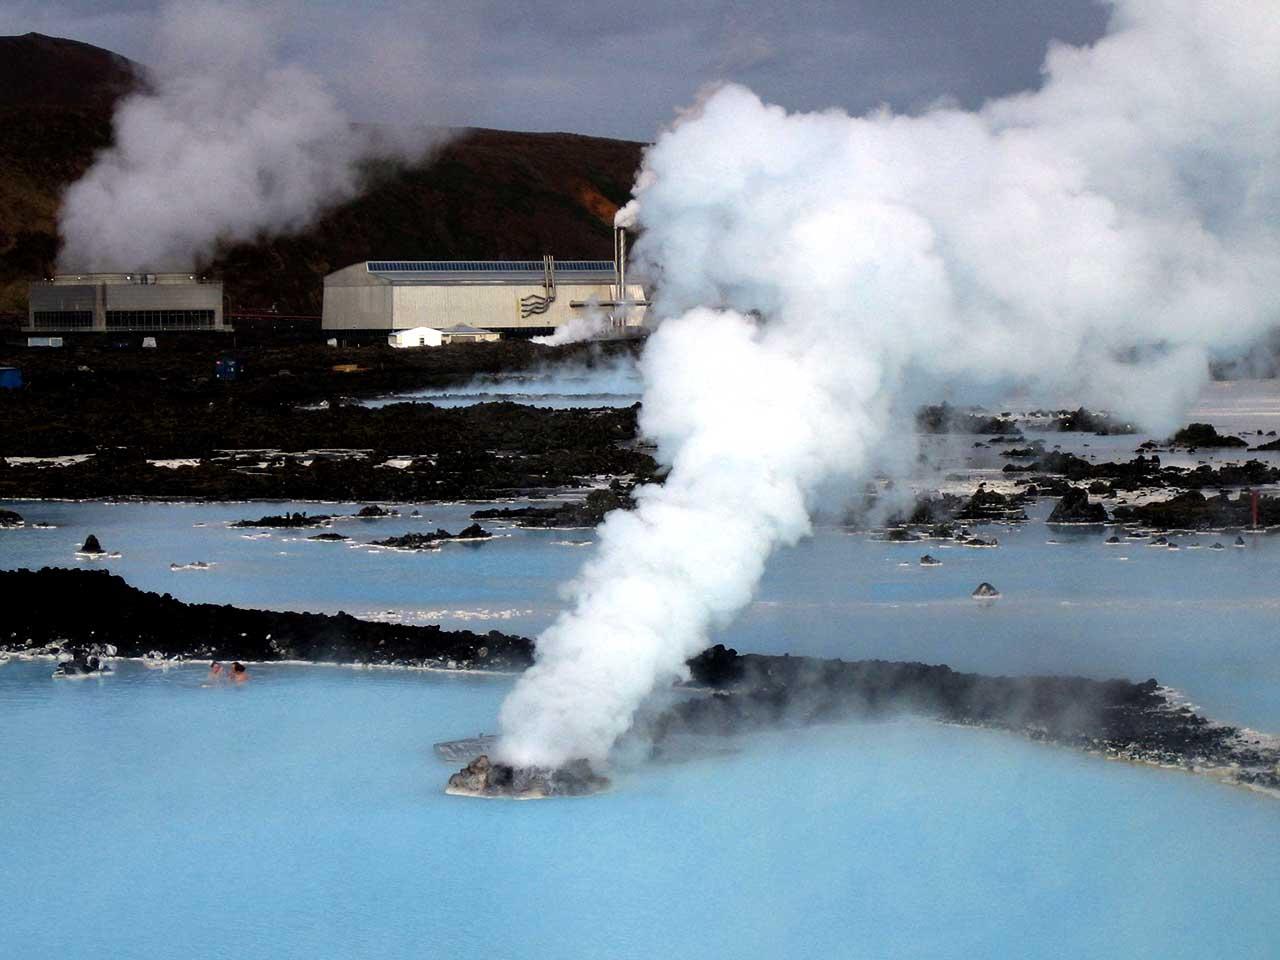 Iceland uses geo-thermal energy